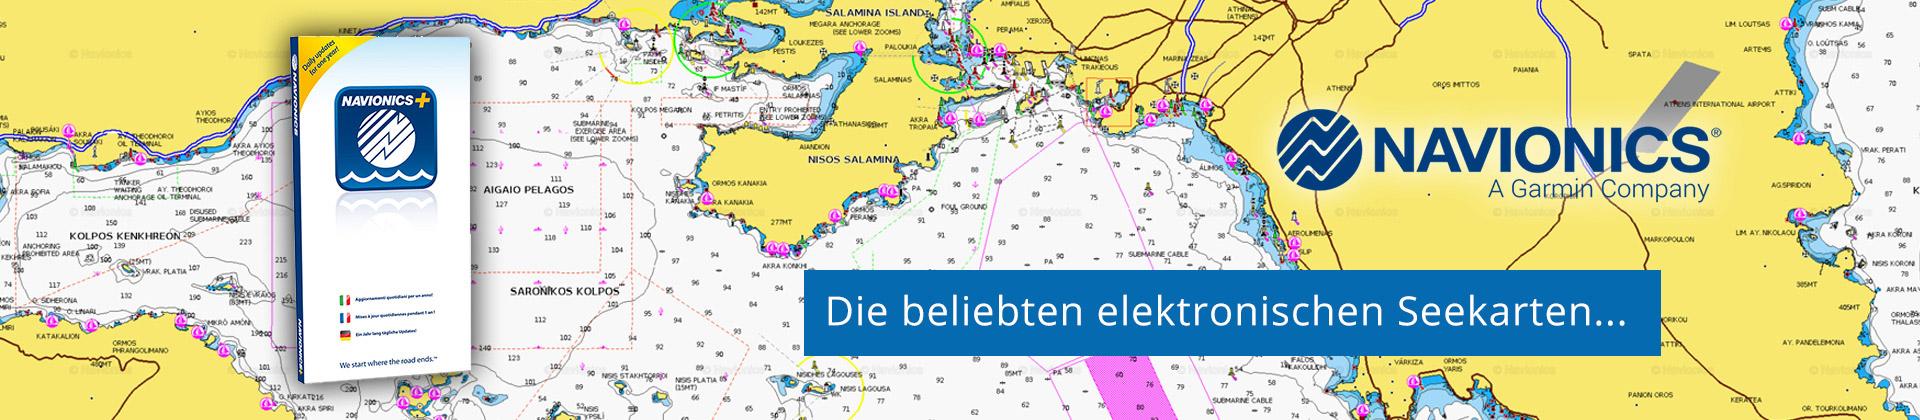 Navionics Seekarten für Plotter